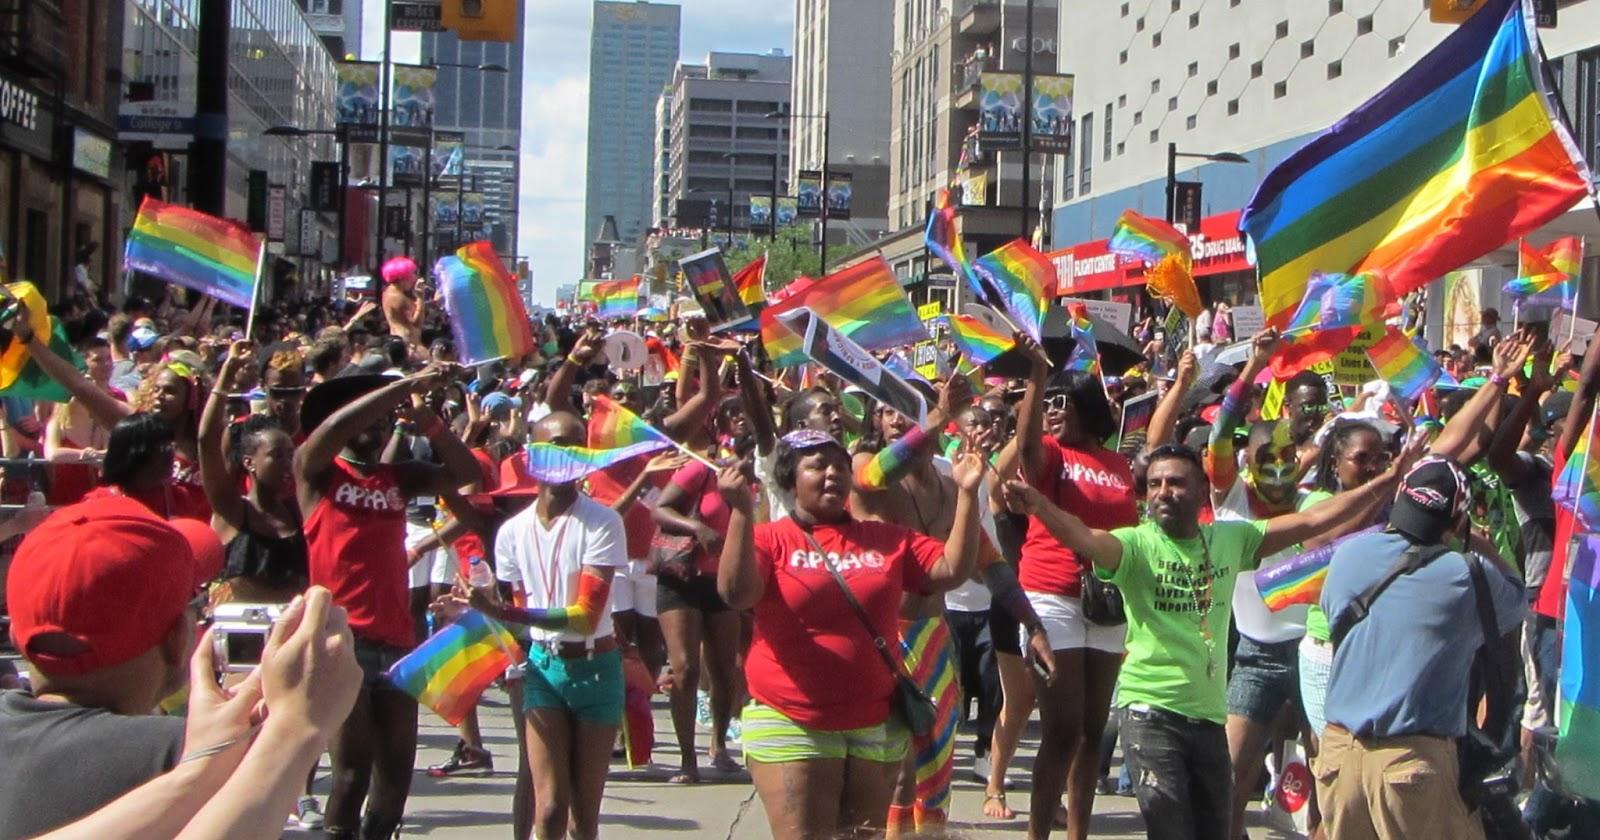 Montreal Pride parade celebrating 10 years of diversity